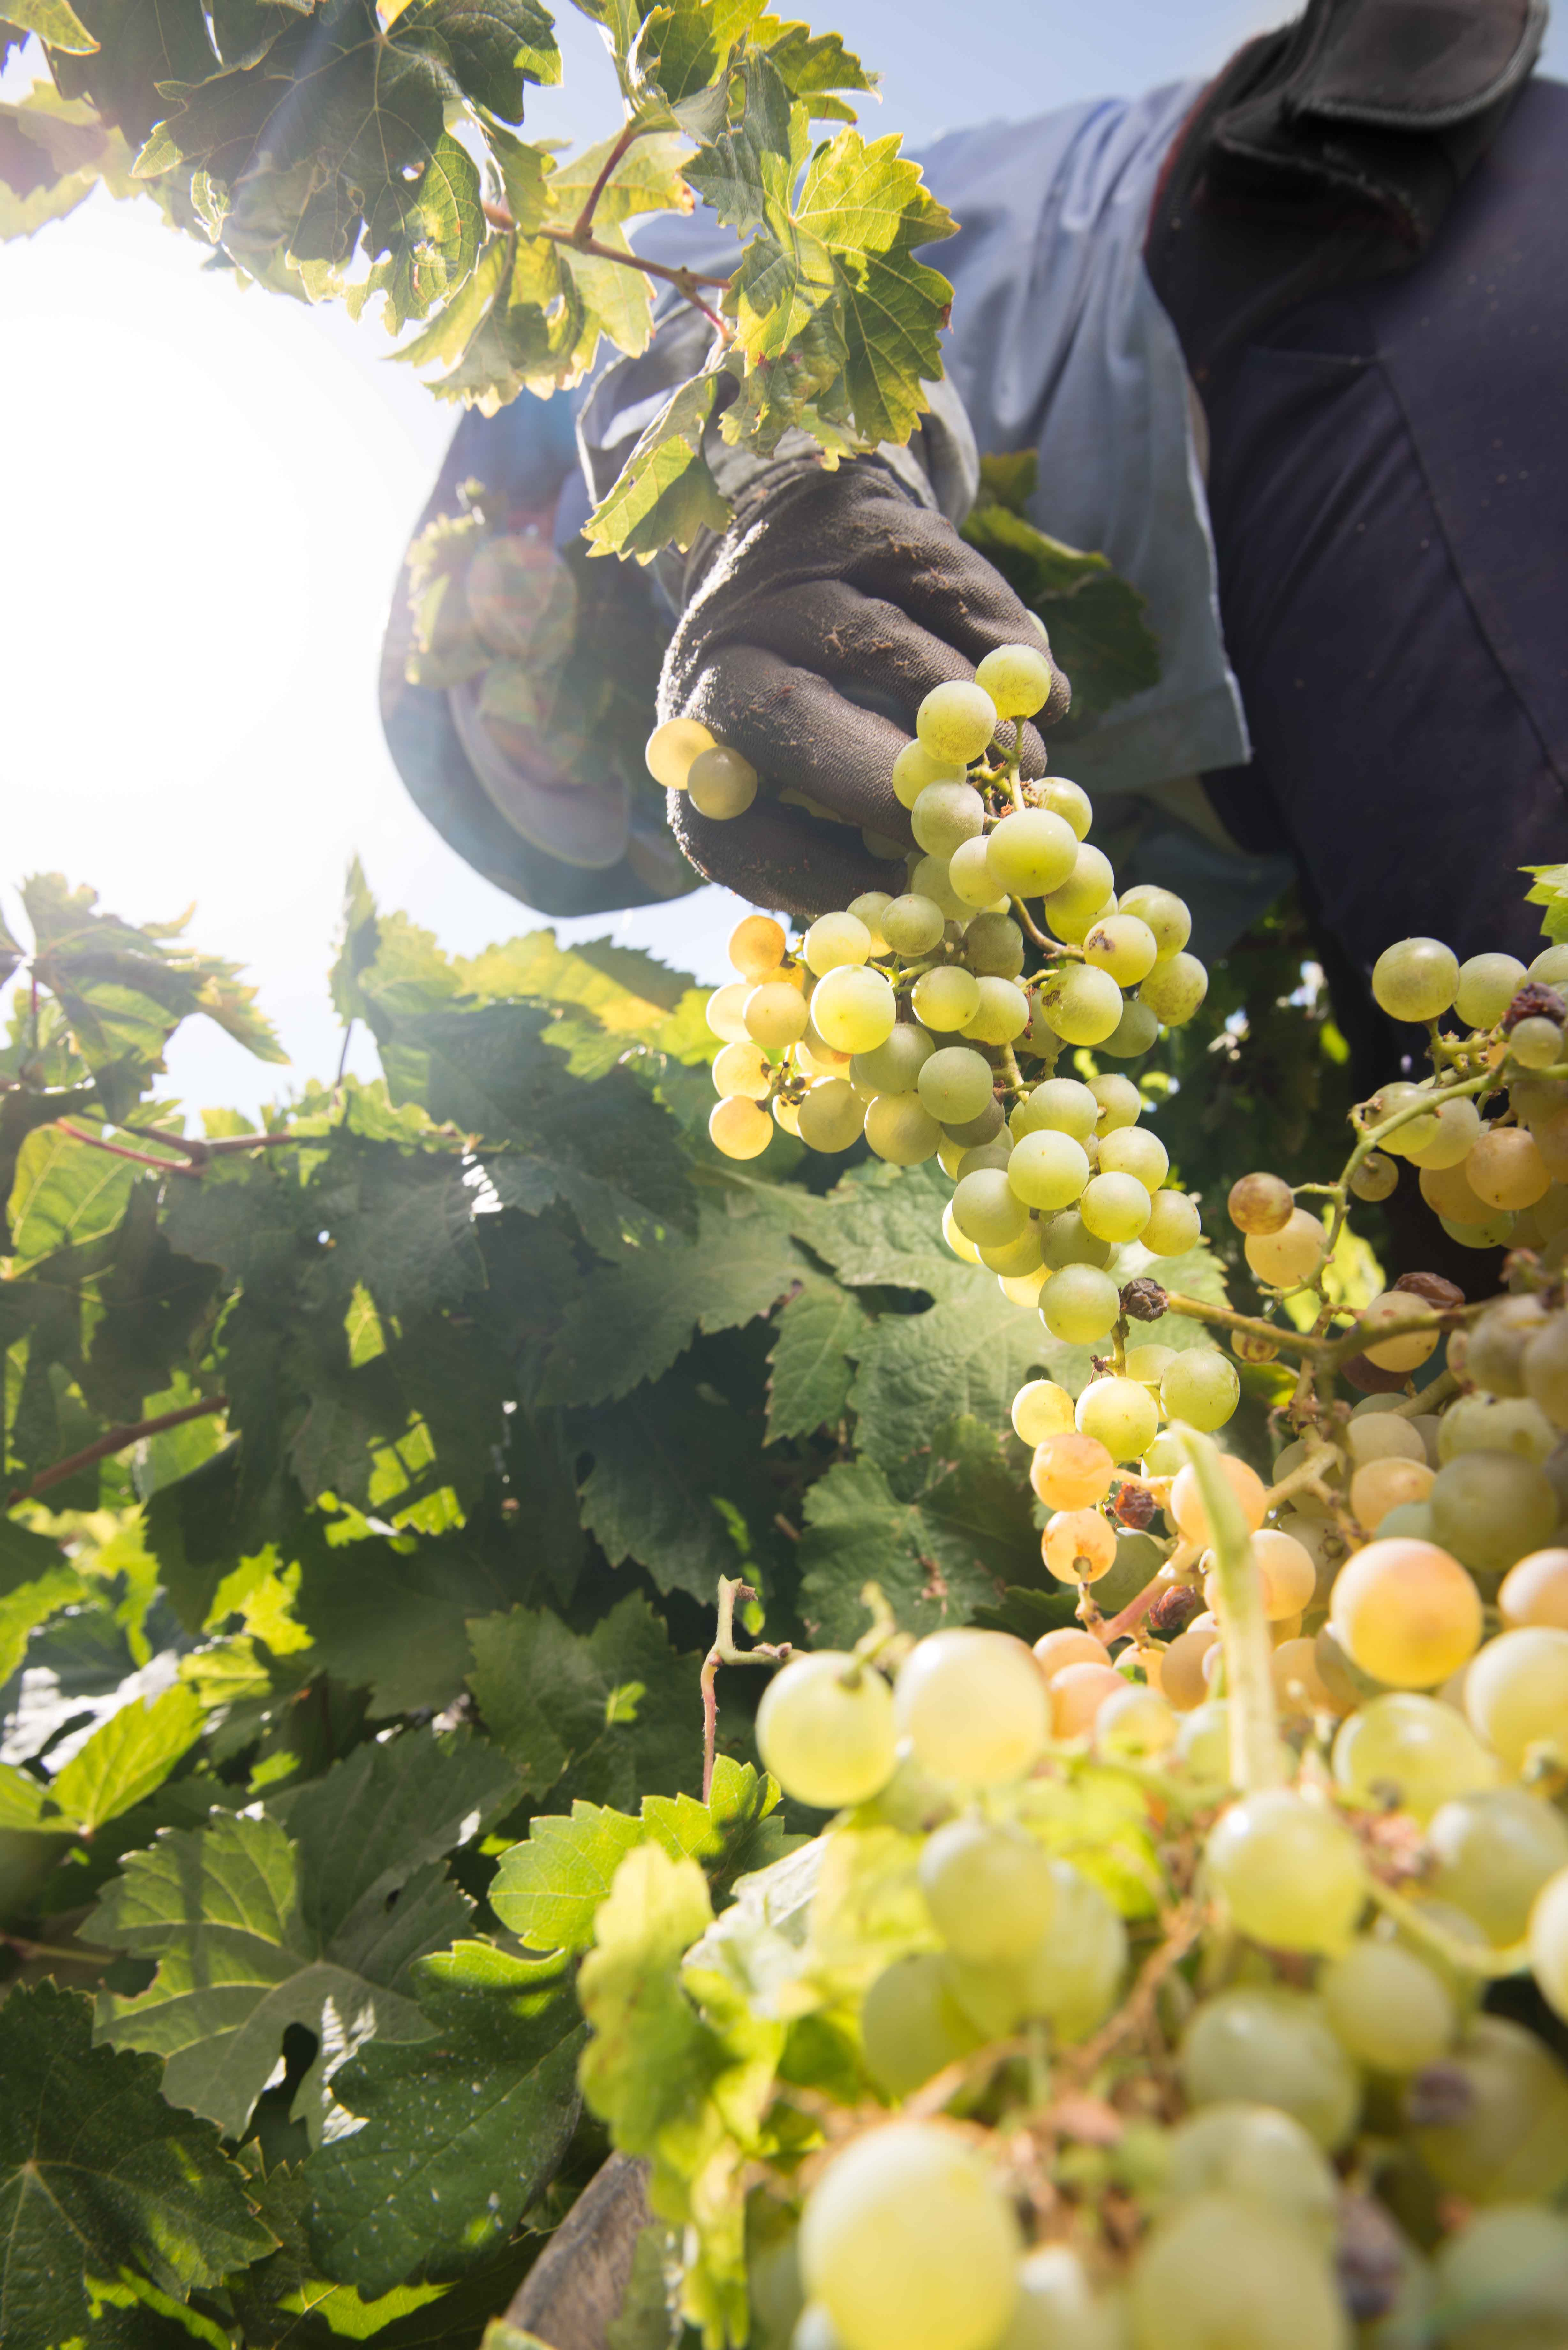 Bodegas Barbadillo prevé recolectar 8.100.000 kilos de uva de todas sus  variedades